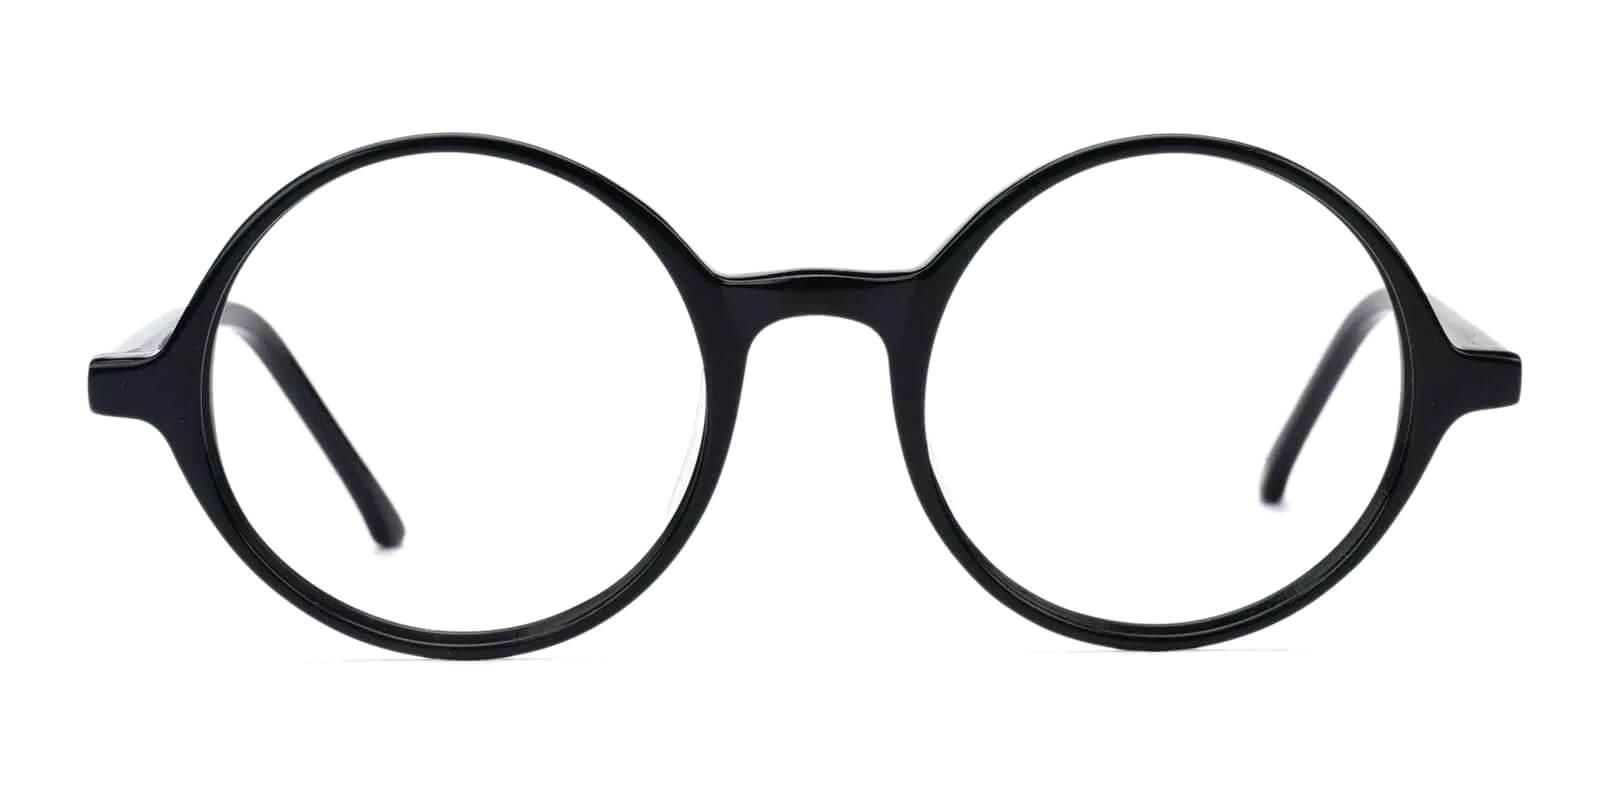 Belinda Black Acetate Eyeglasses , Fashion , SpringHinges , UniversalBridgeFit Frames from ABBE Glasses